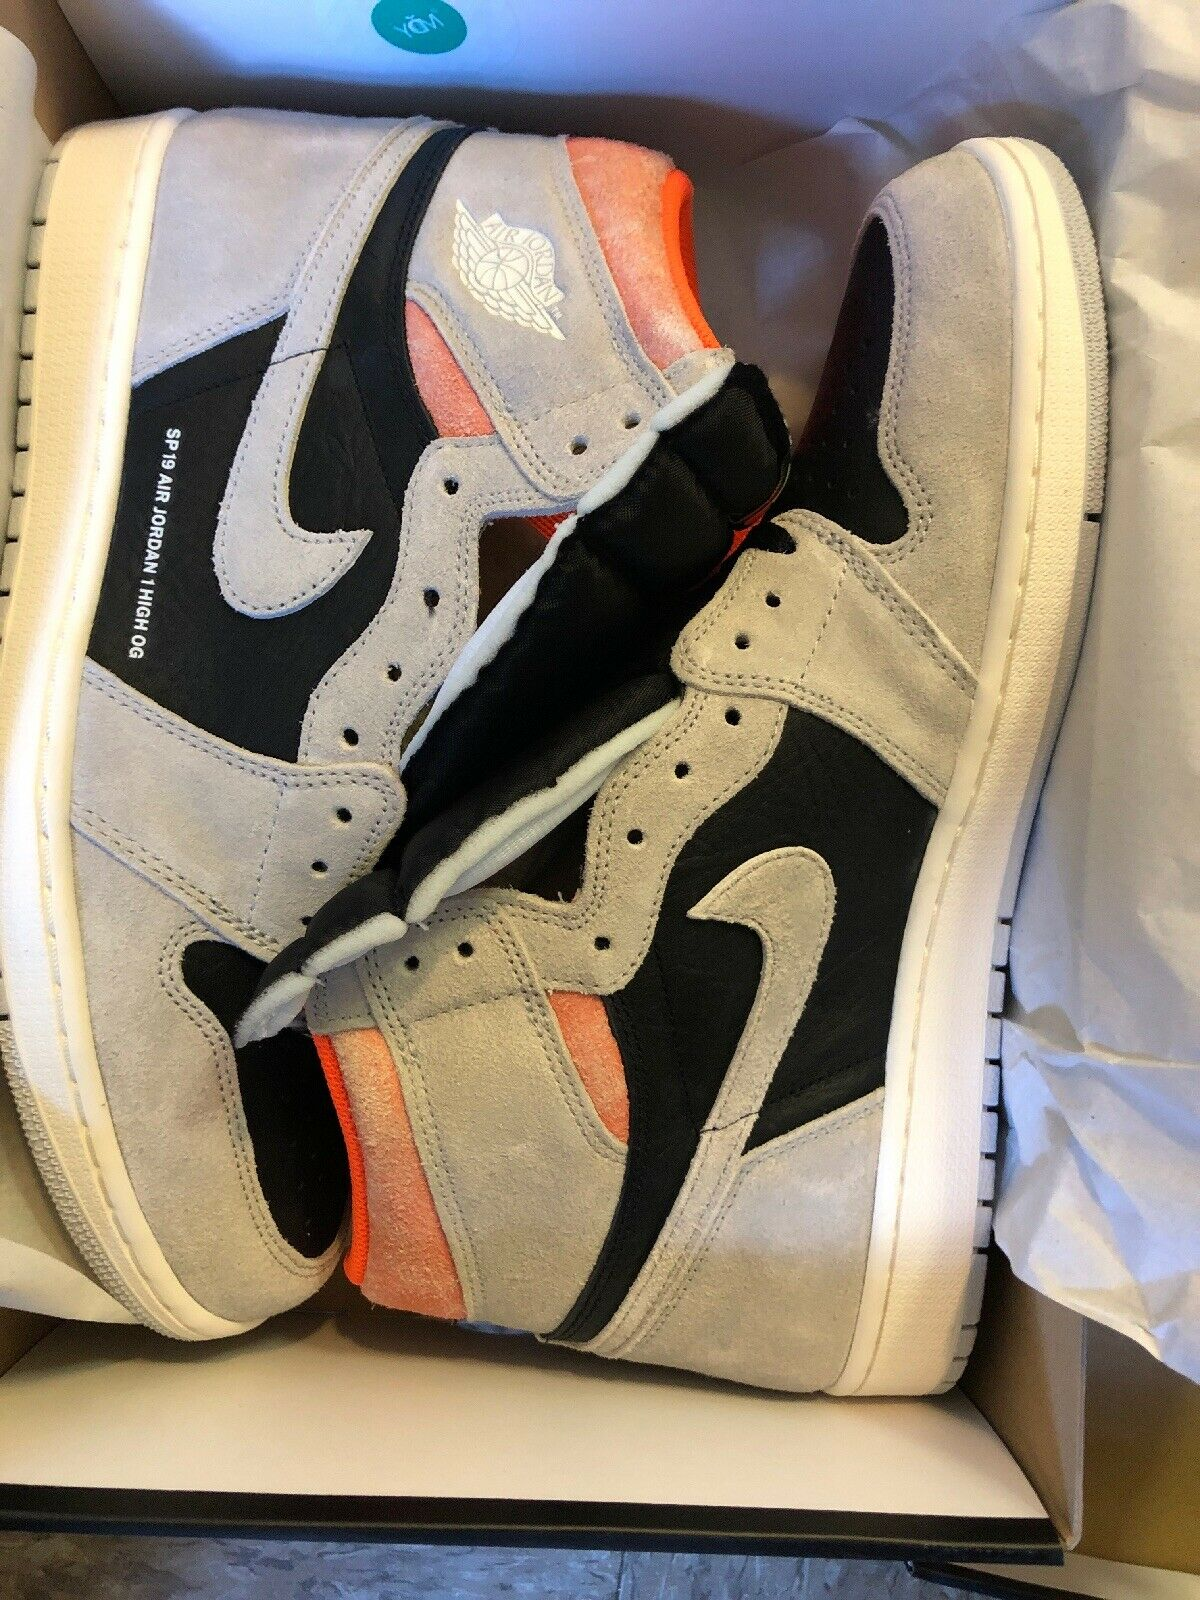 New Nike Nike Nike Air Jordan 1  Retro High OG Neutral Grey SP 19 DS Size 13 322206